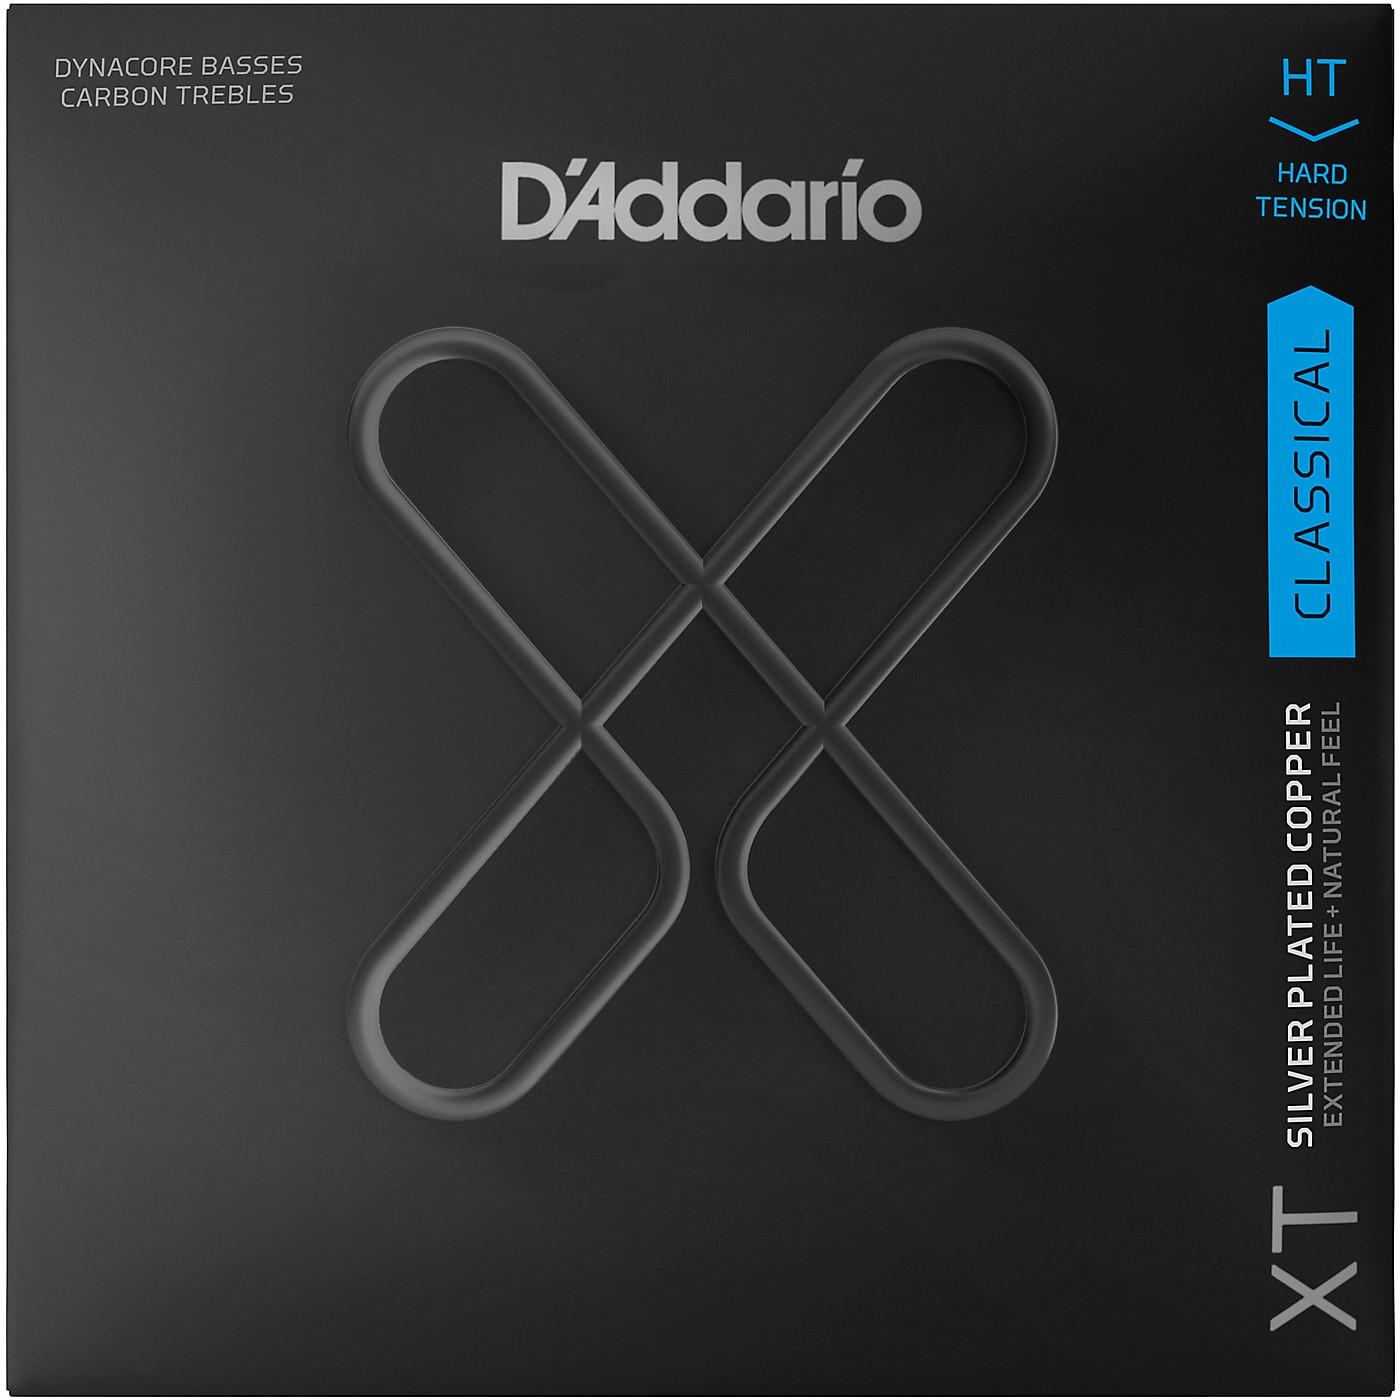 D'Addario XT Dynacore Fluorocarbon Classical Strings thumbnail